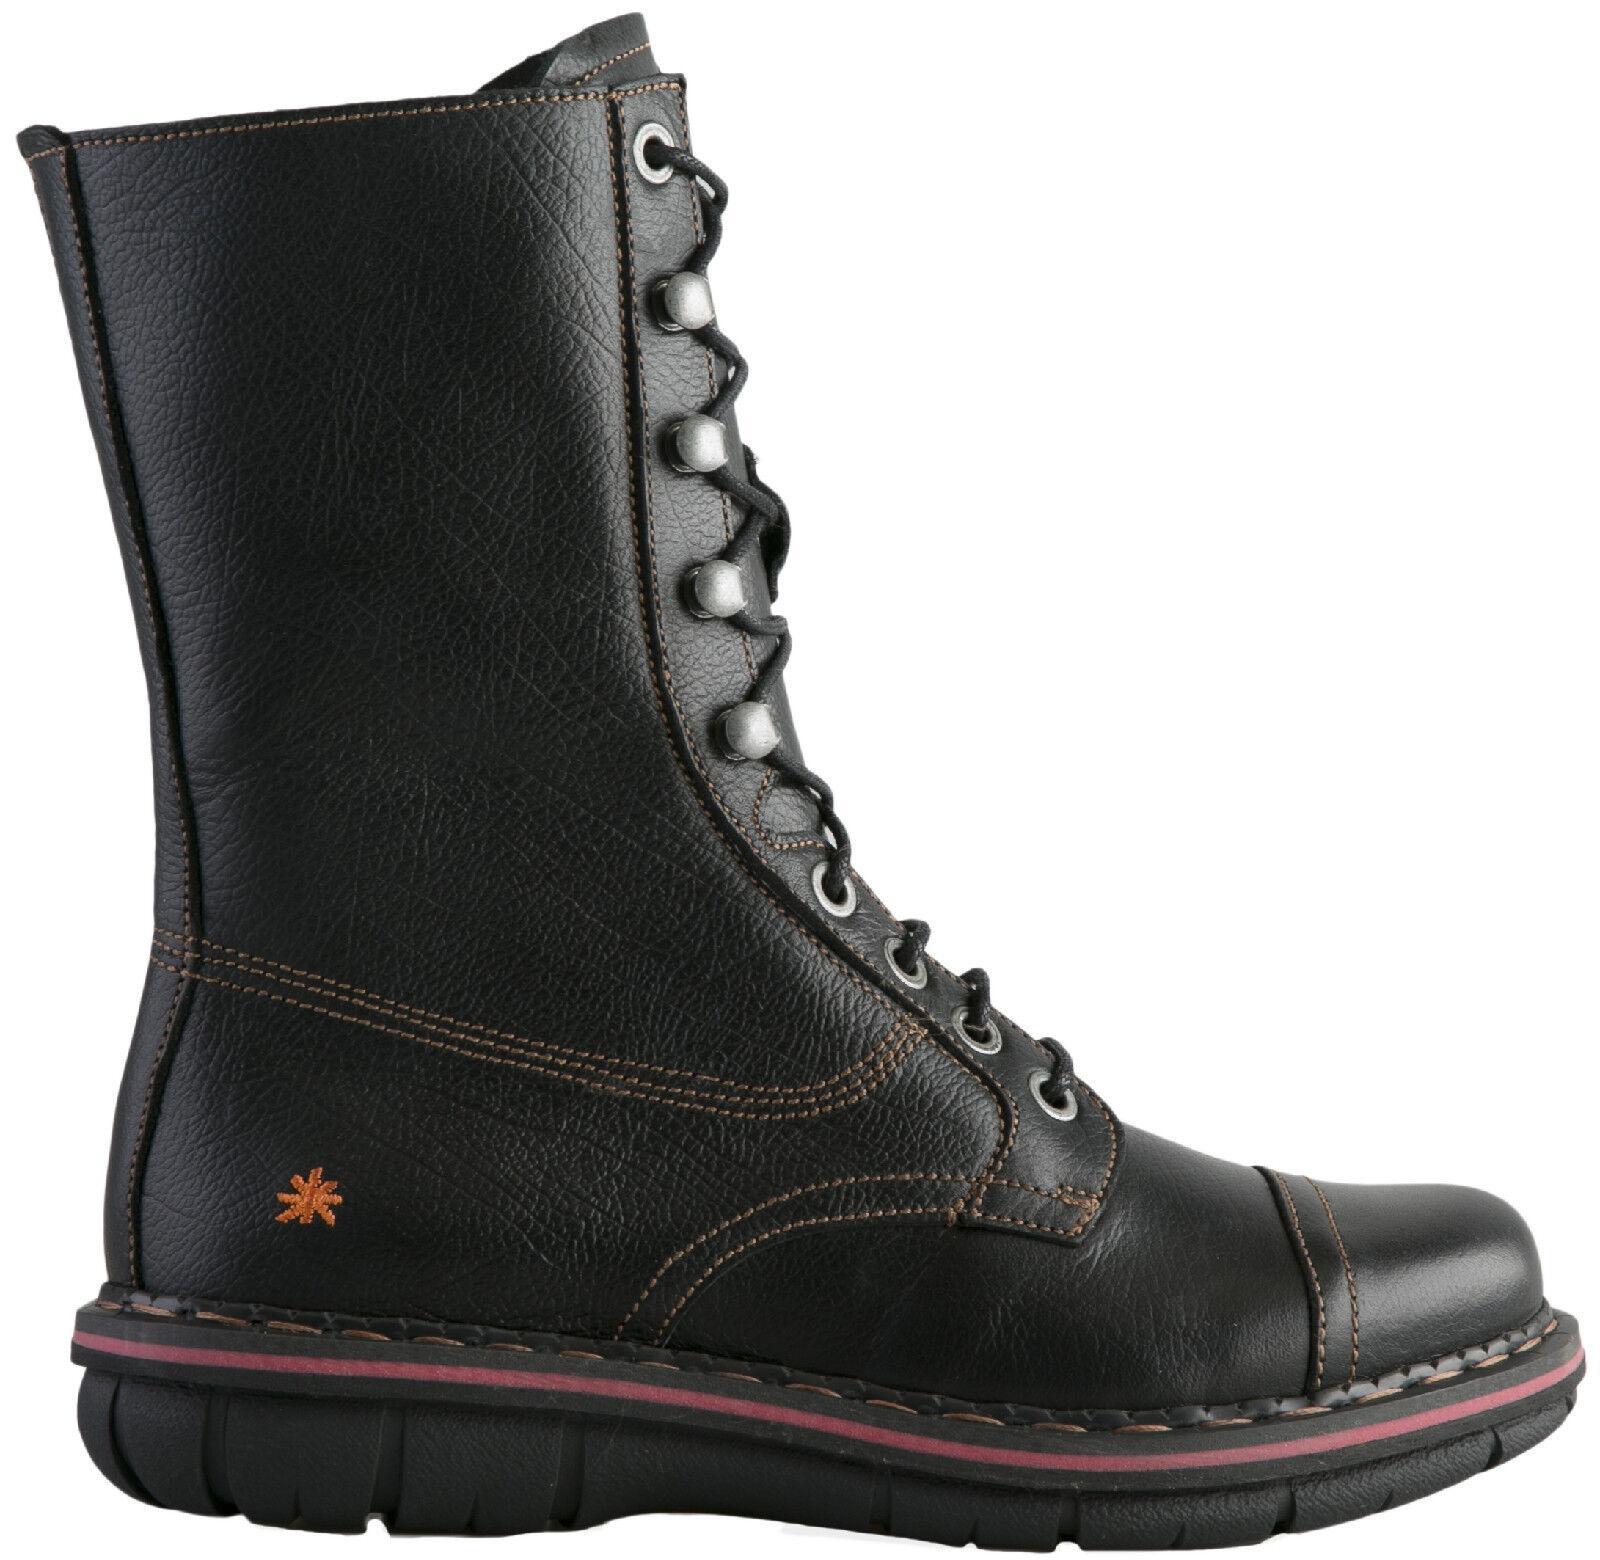 The ART Company Damenschuhe Schuhe Stiefel 0436 Gaucho Black